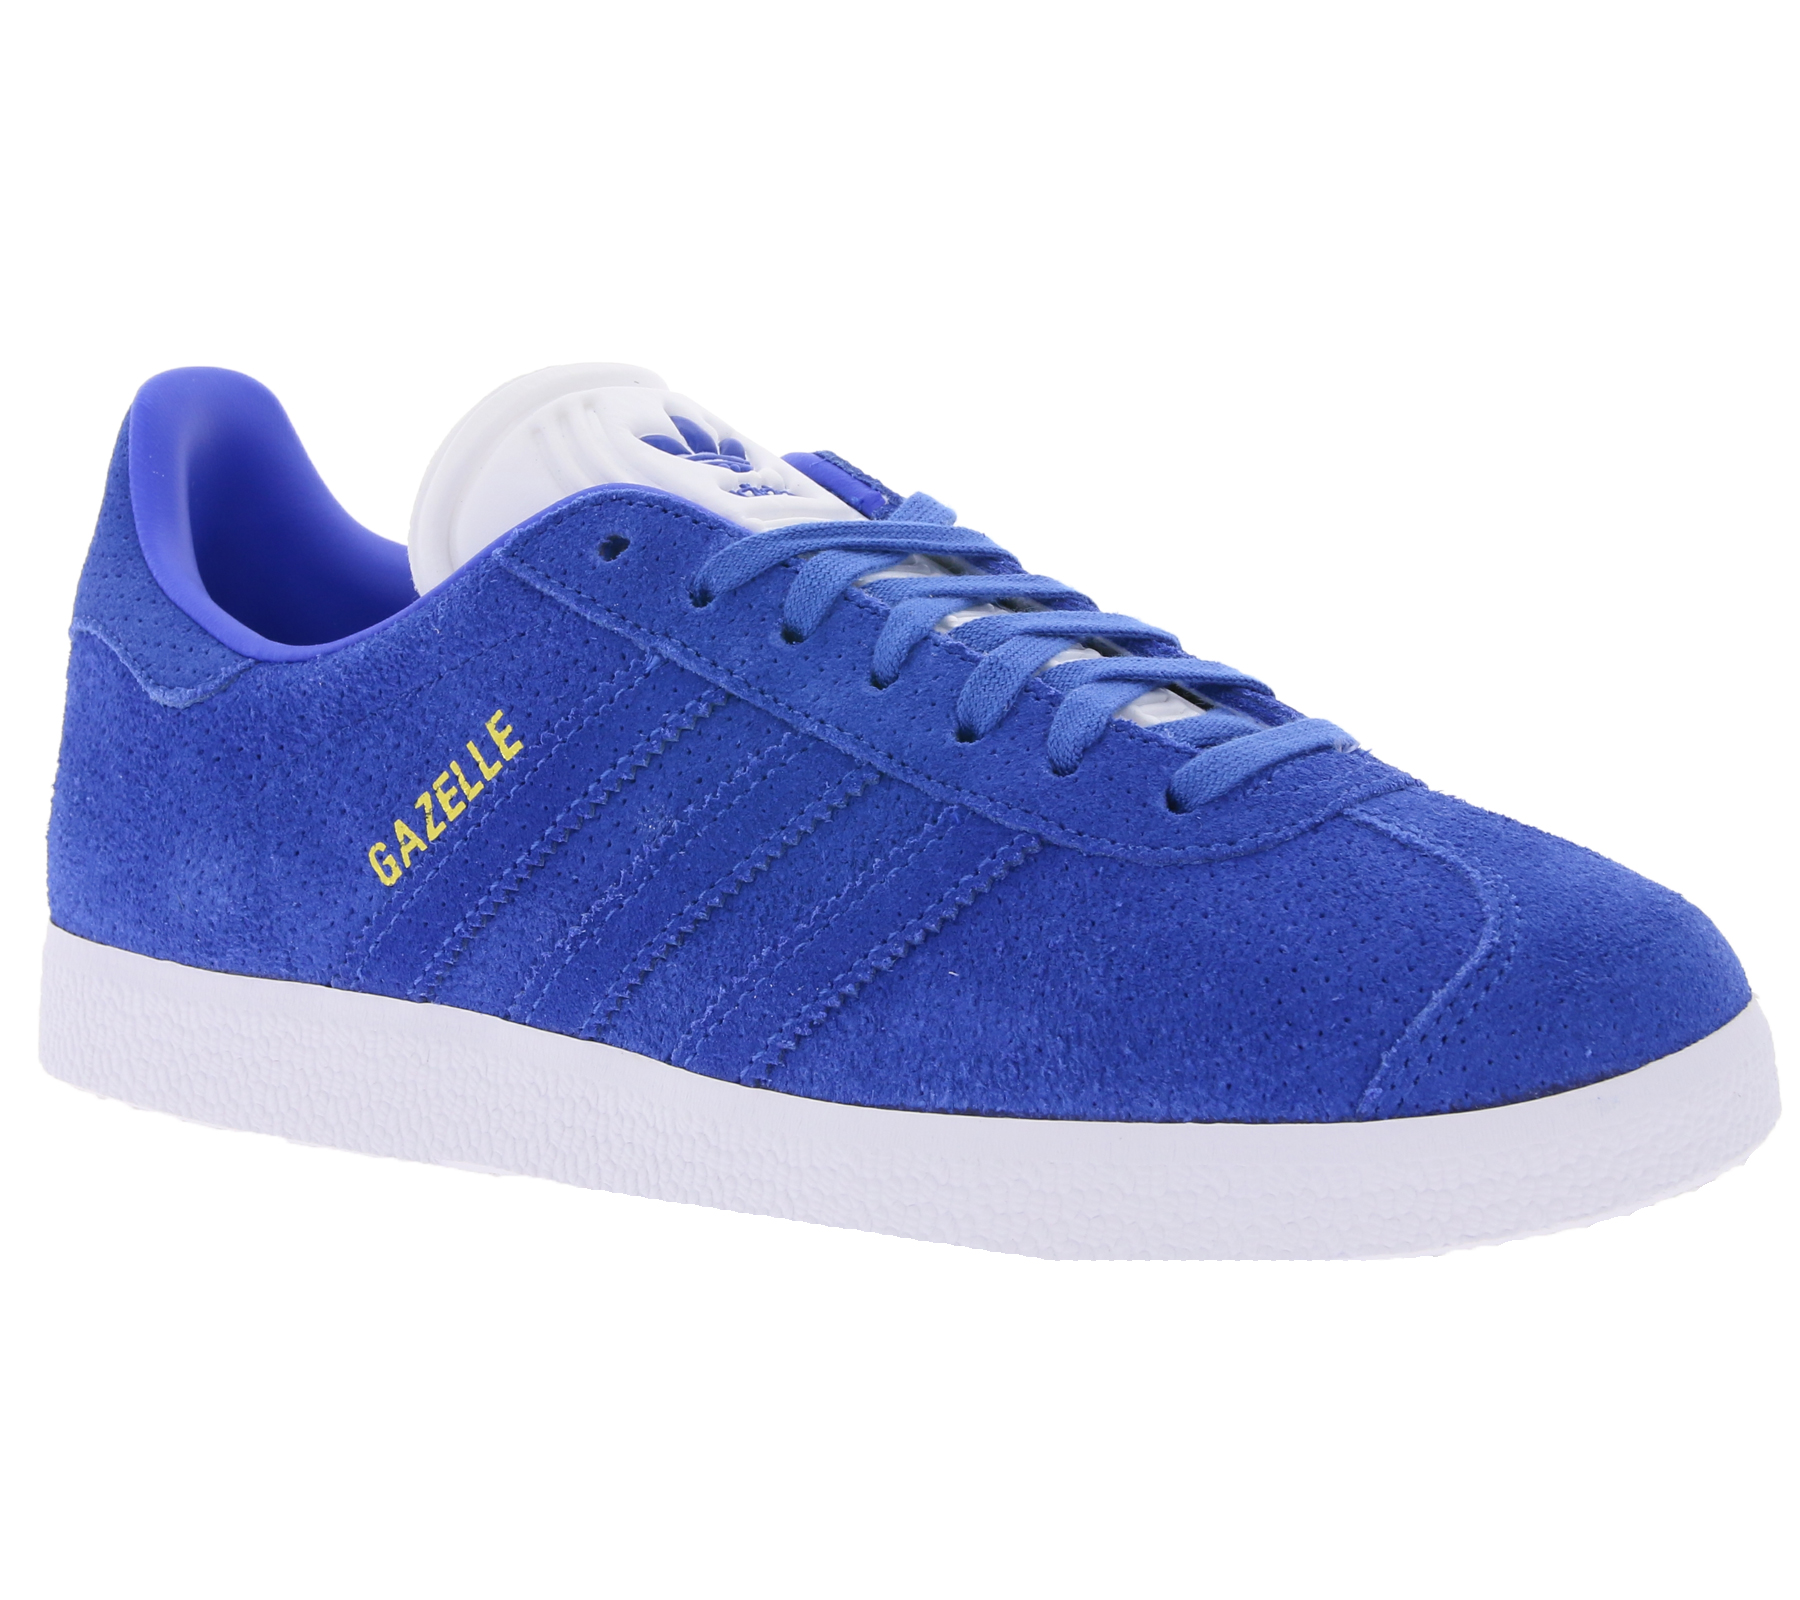 446823a0411882 Outlet Online Adidas Shopamp  Originals Gazelle 46 SzpjqUMVLG